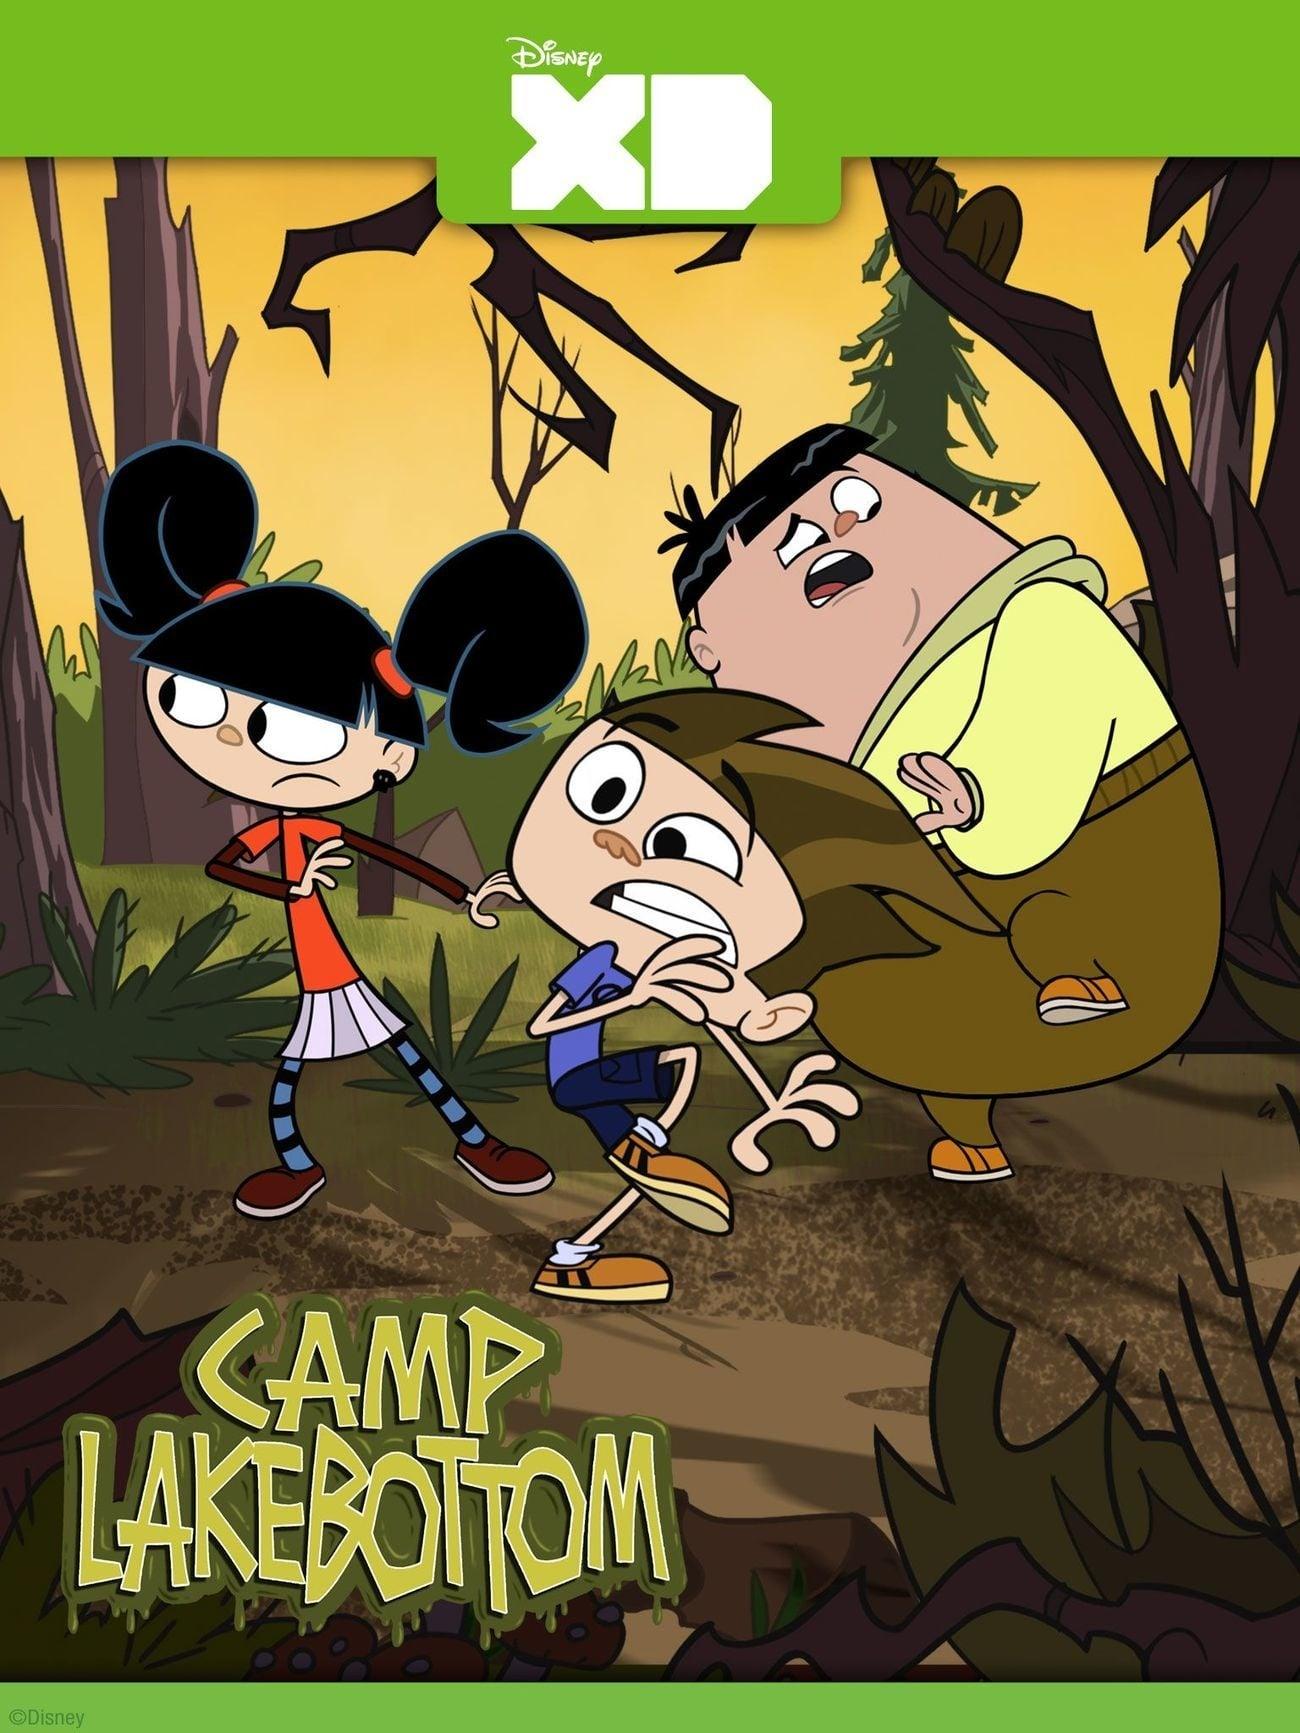 Campamento Lakebottom